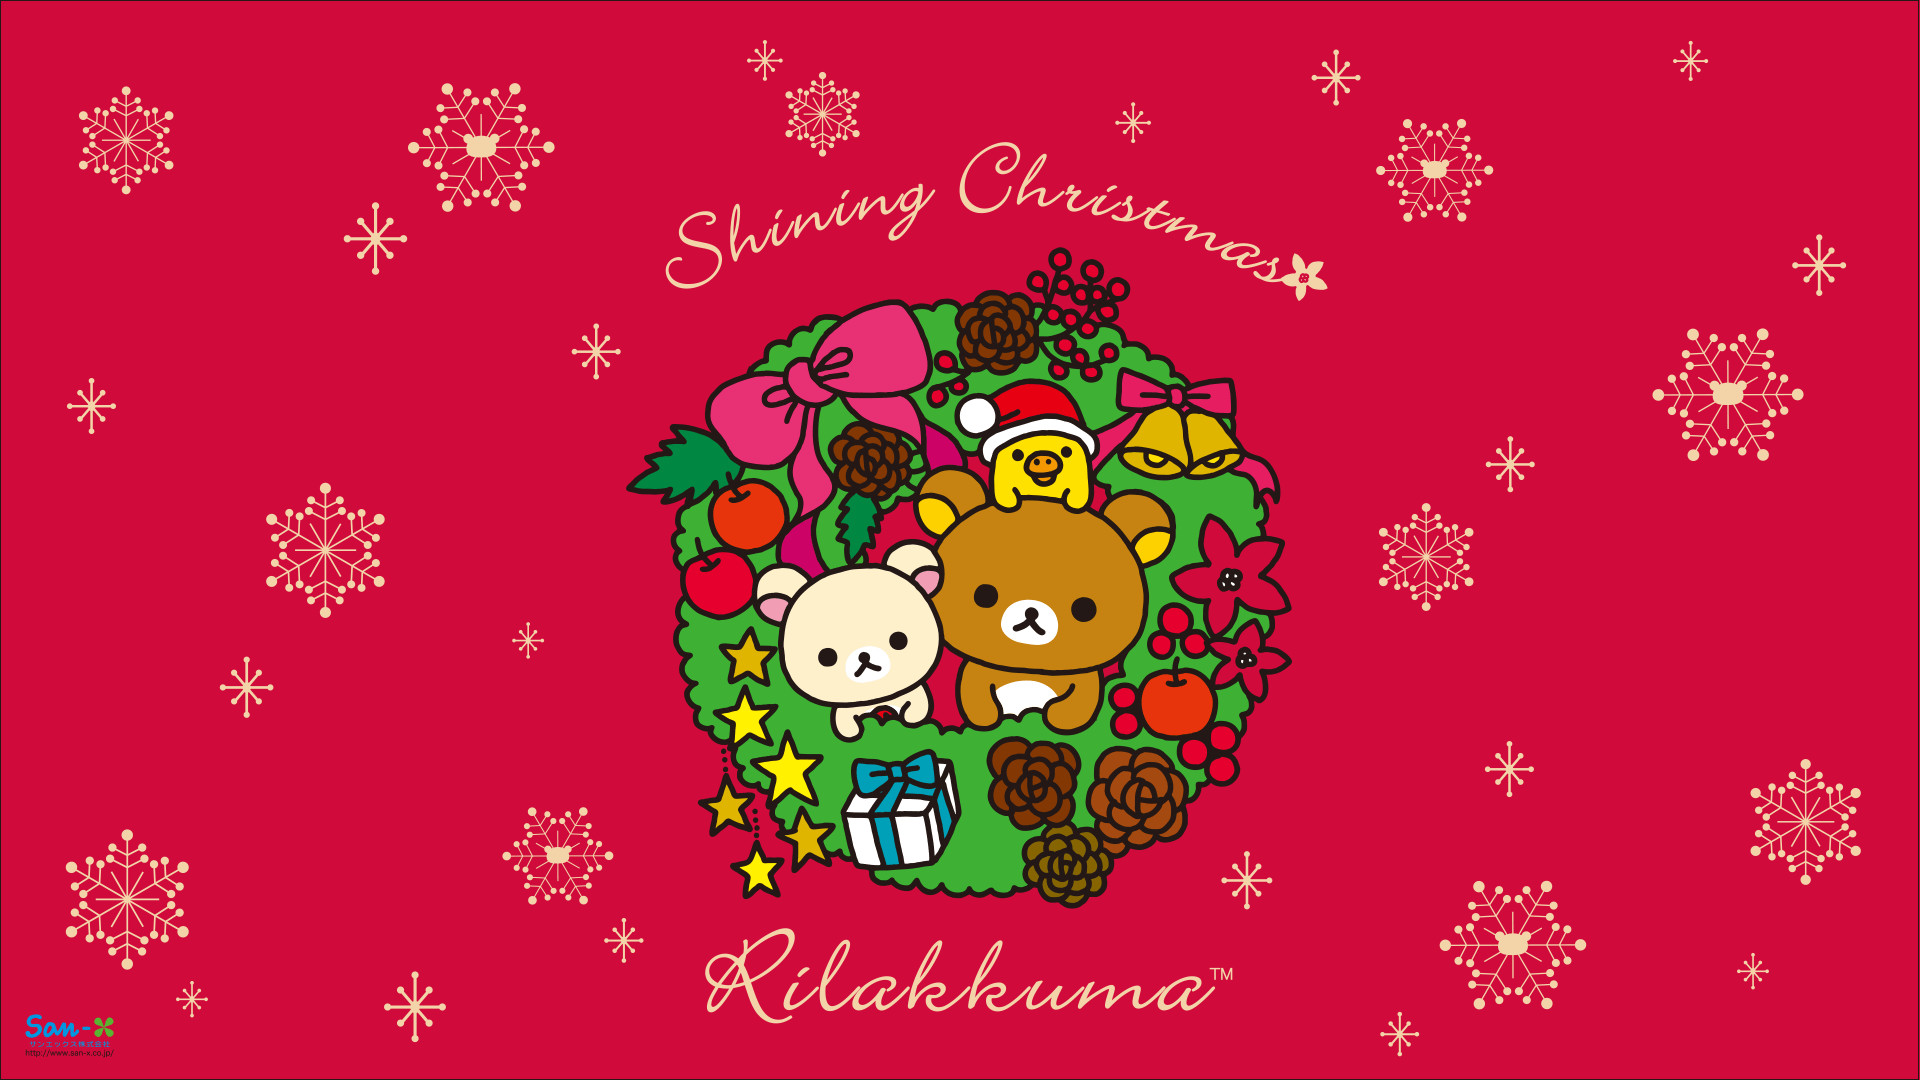 Hello kitty valentine wallpaper 58 pictures - Kawaii wallpaper hd ...